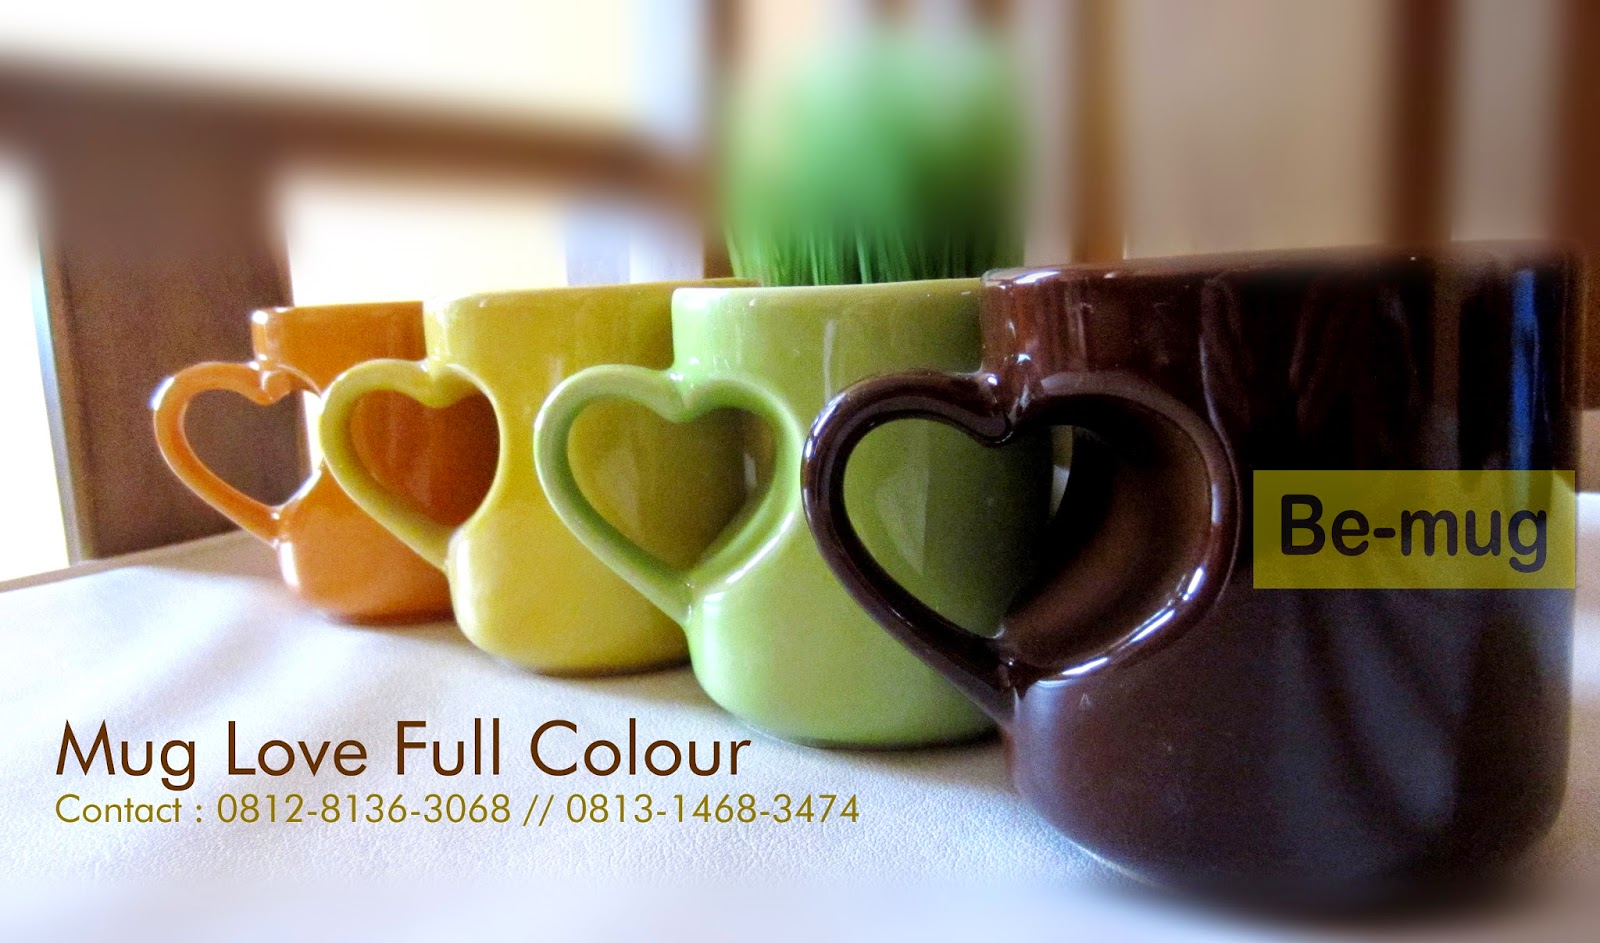 Mug Love Full Colour